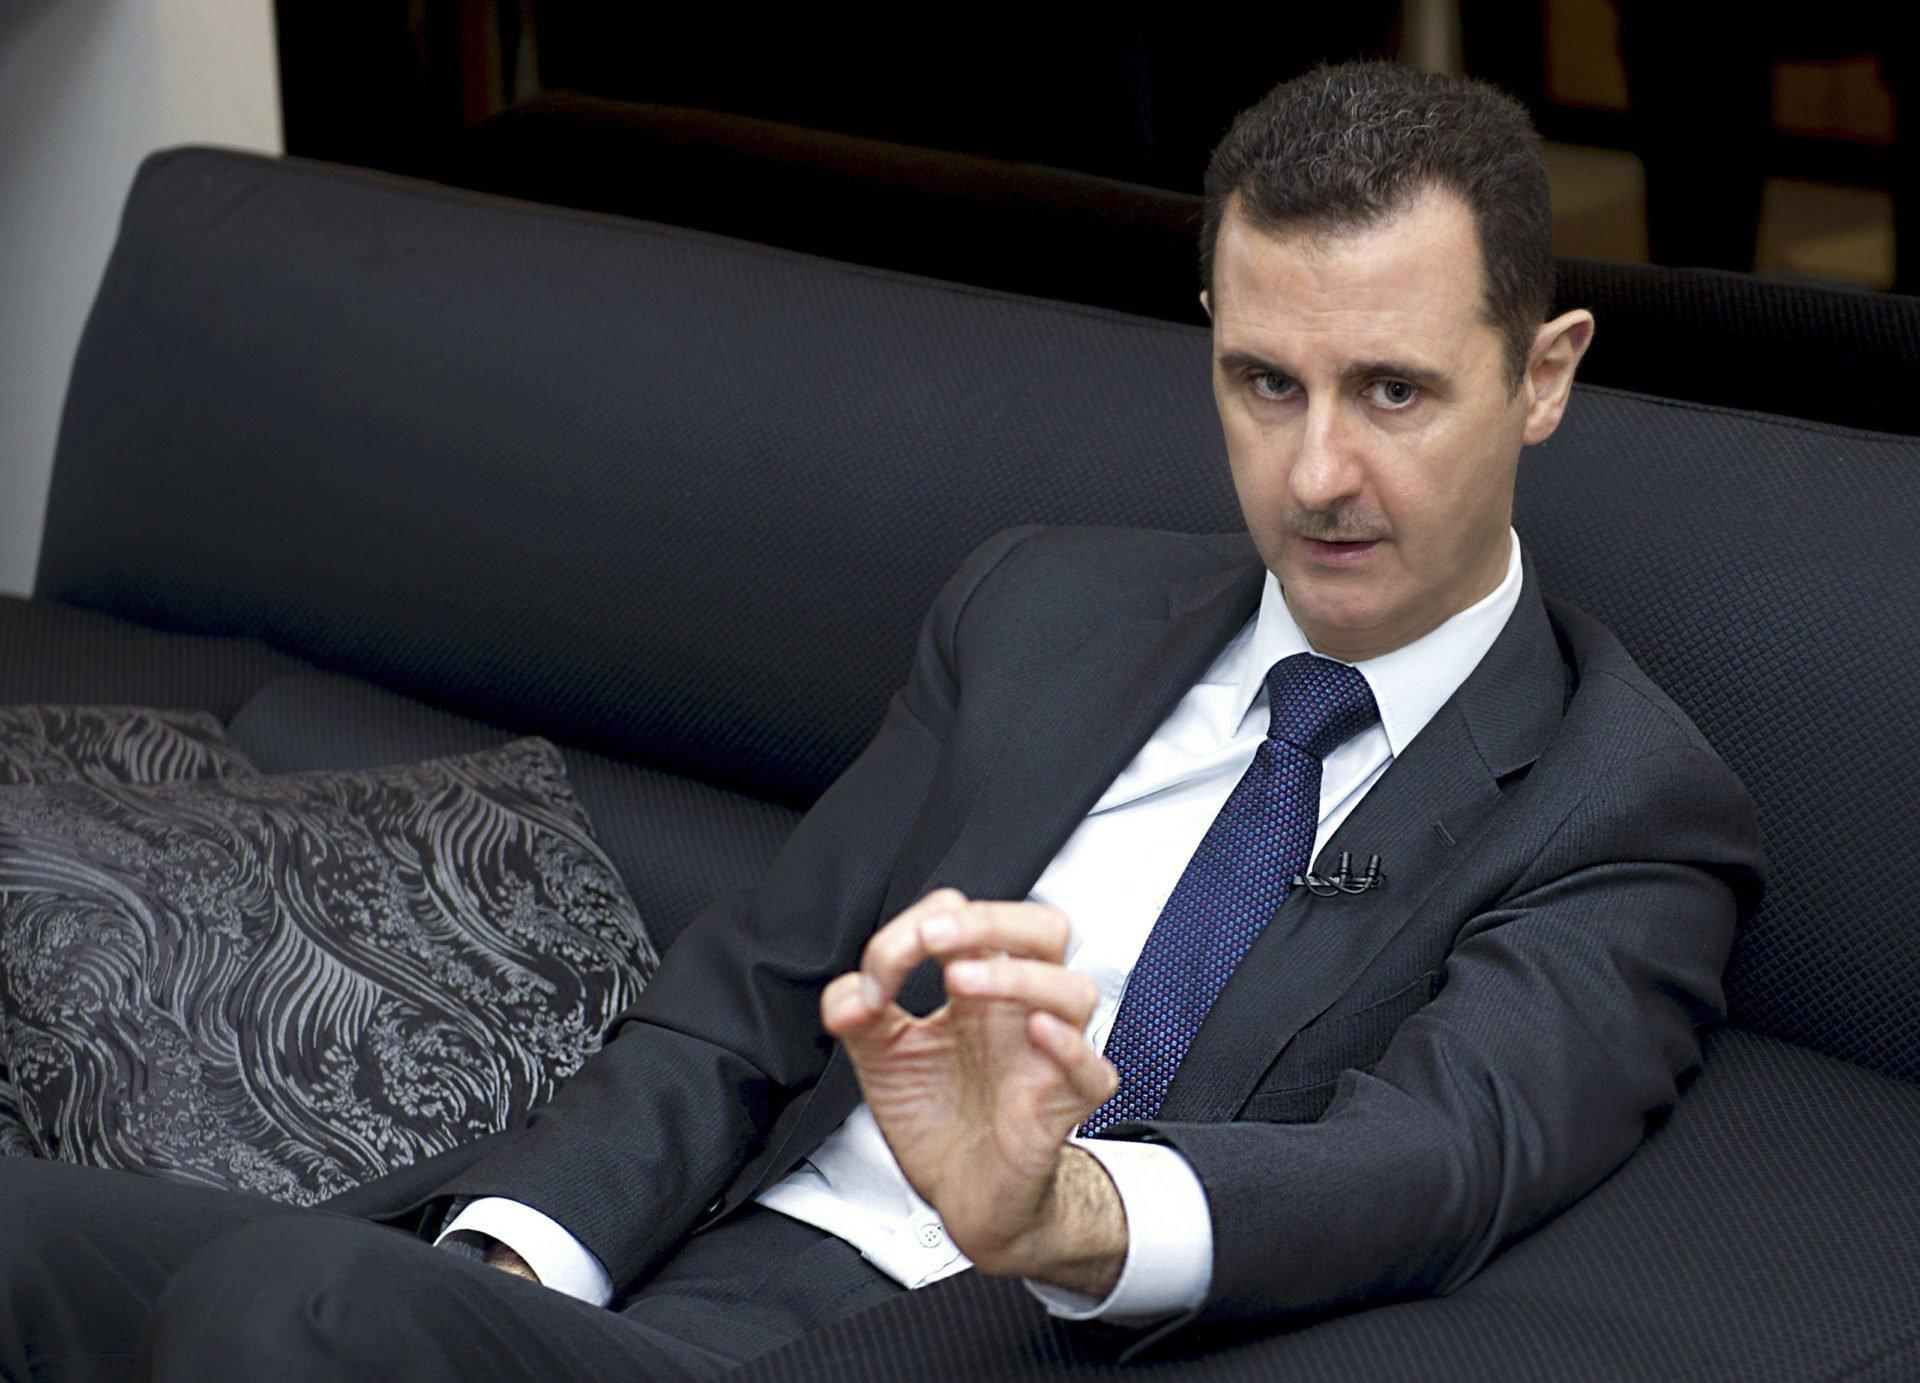 Haley Warns US May Unleash Massive New Airstrikes in Syria